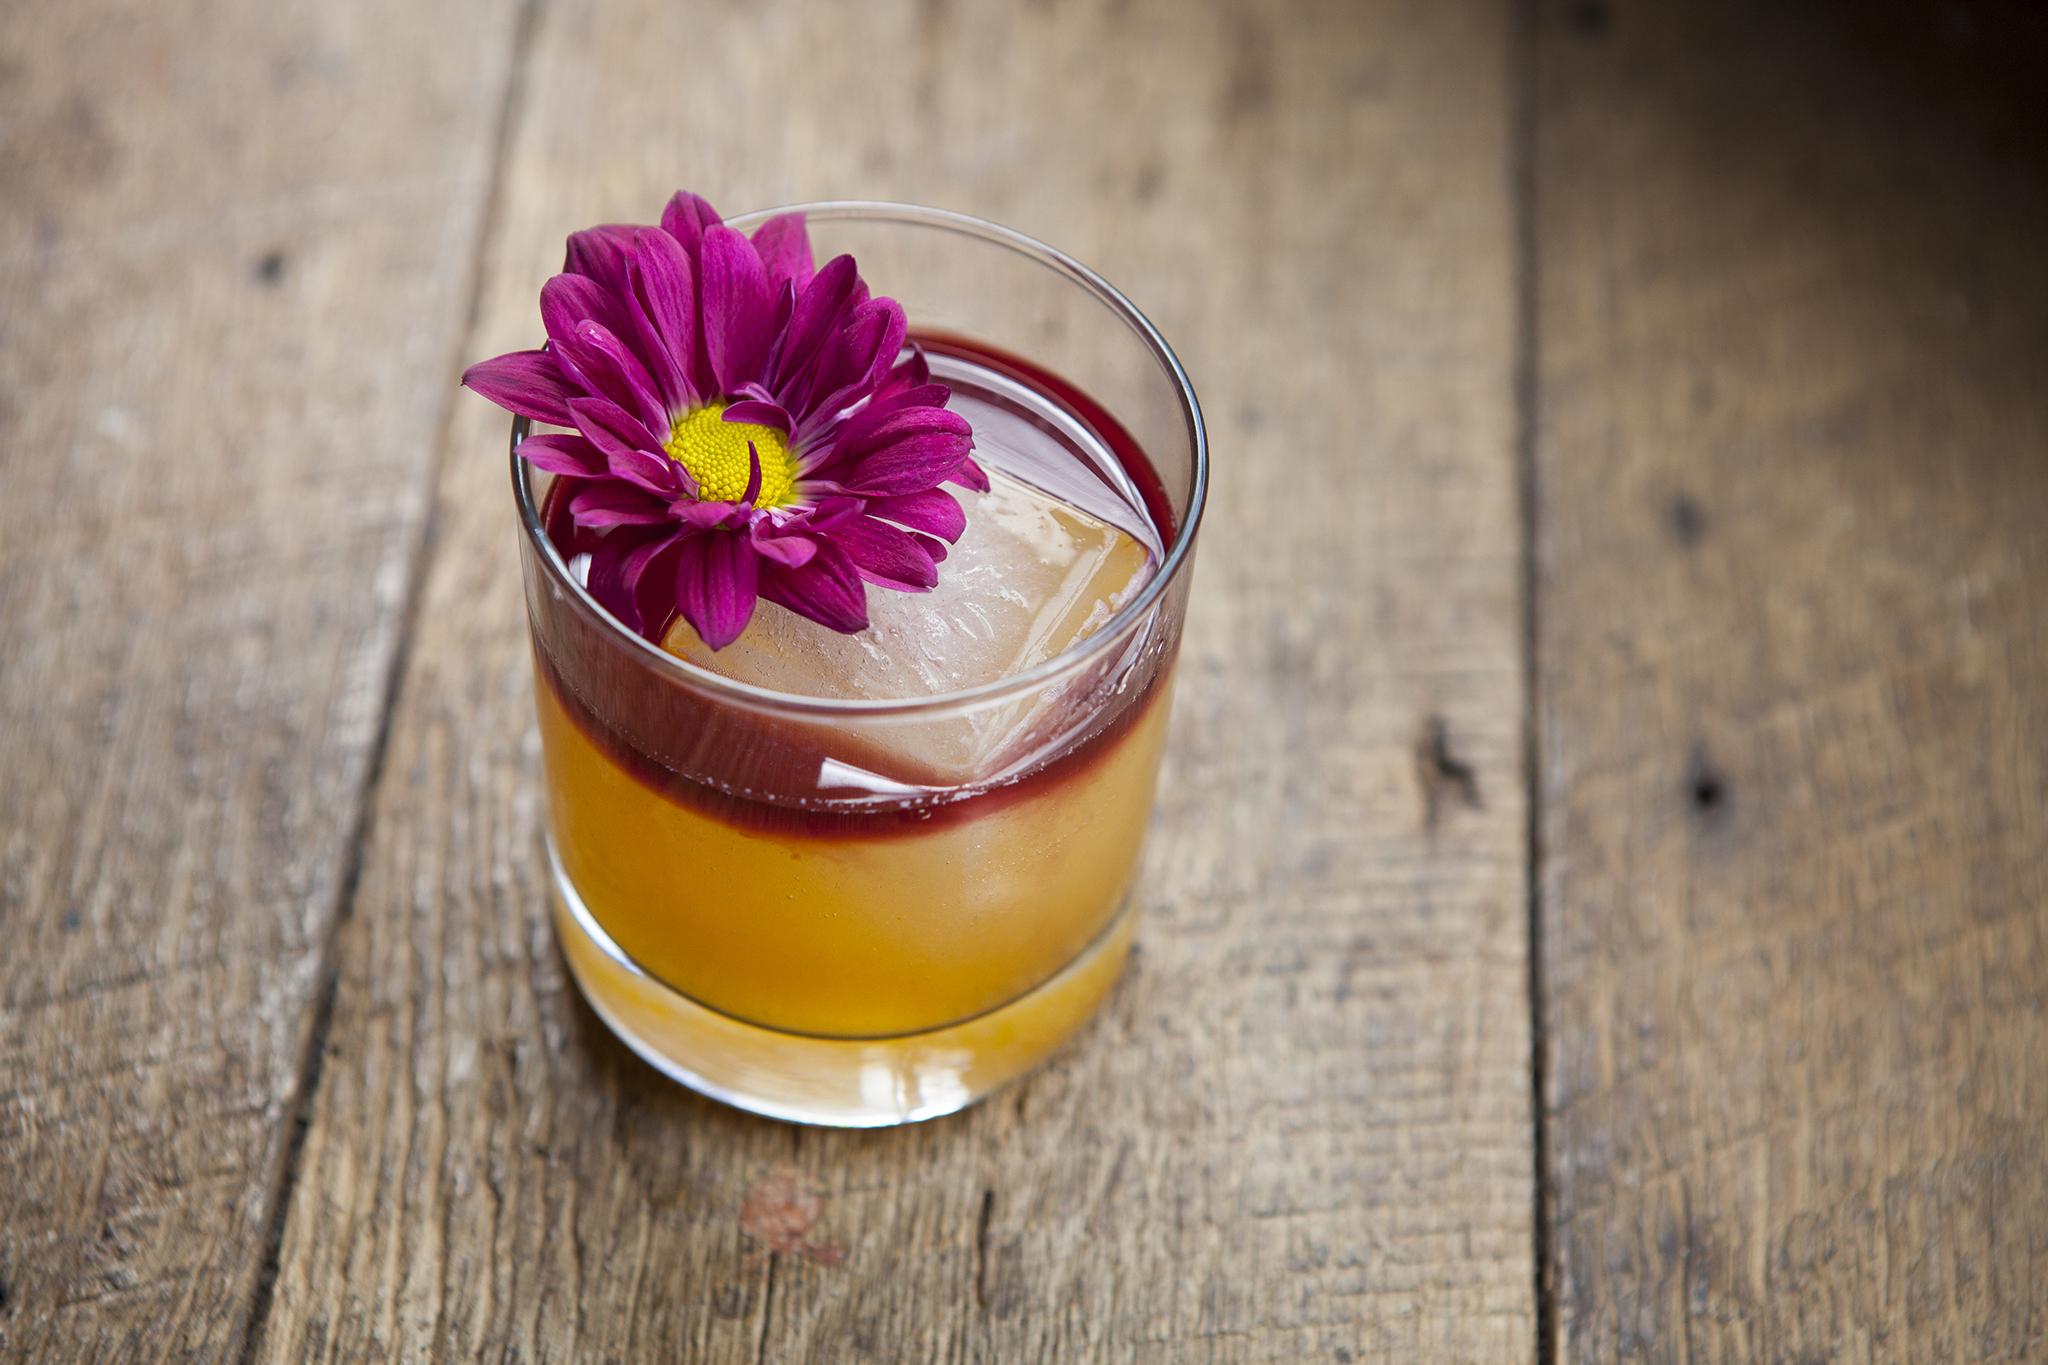 Gracias Madre's spring/summer cocktails